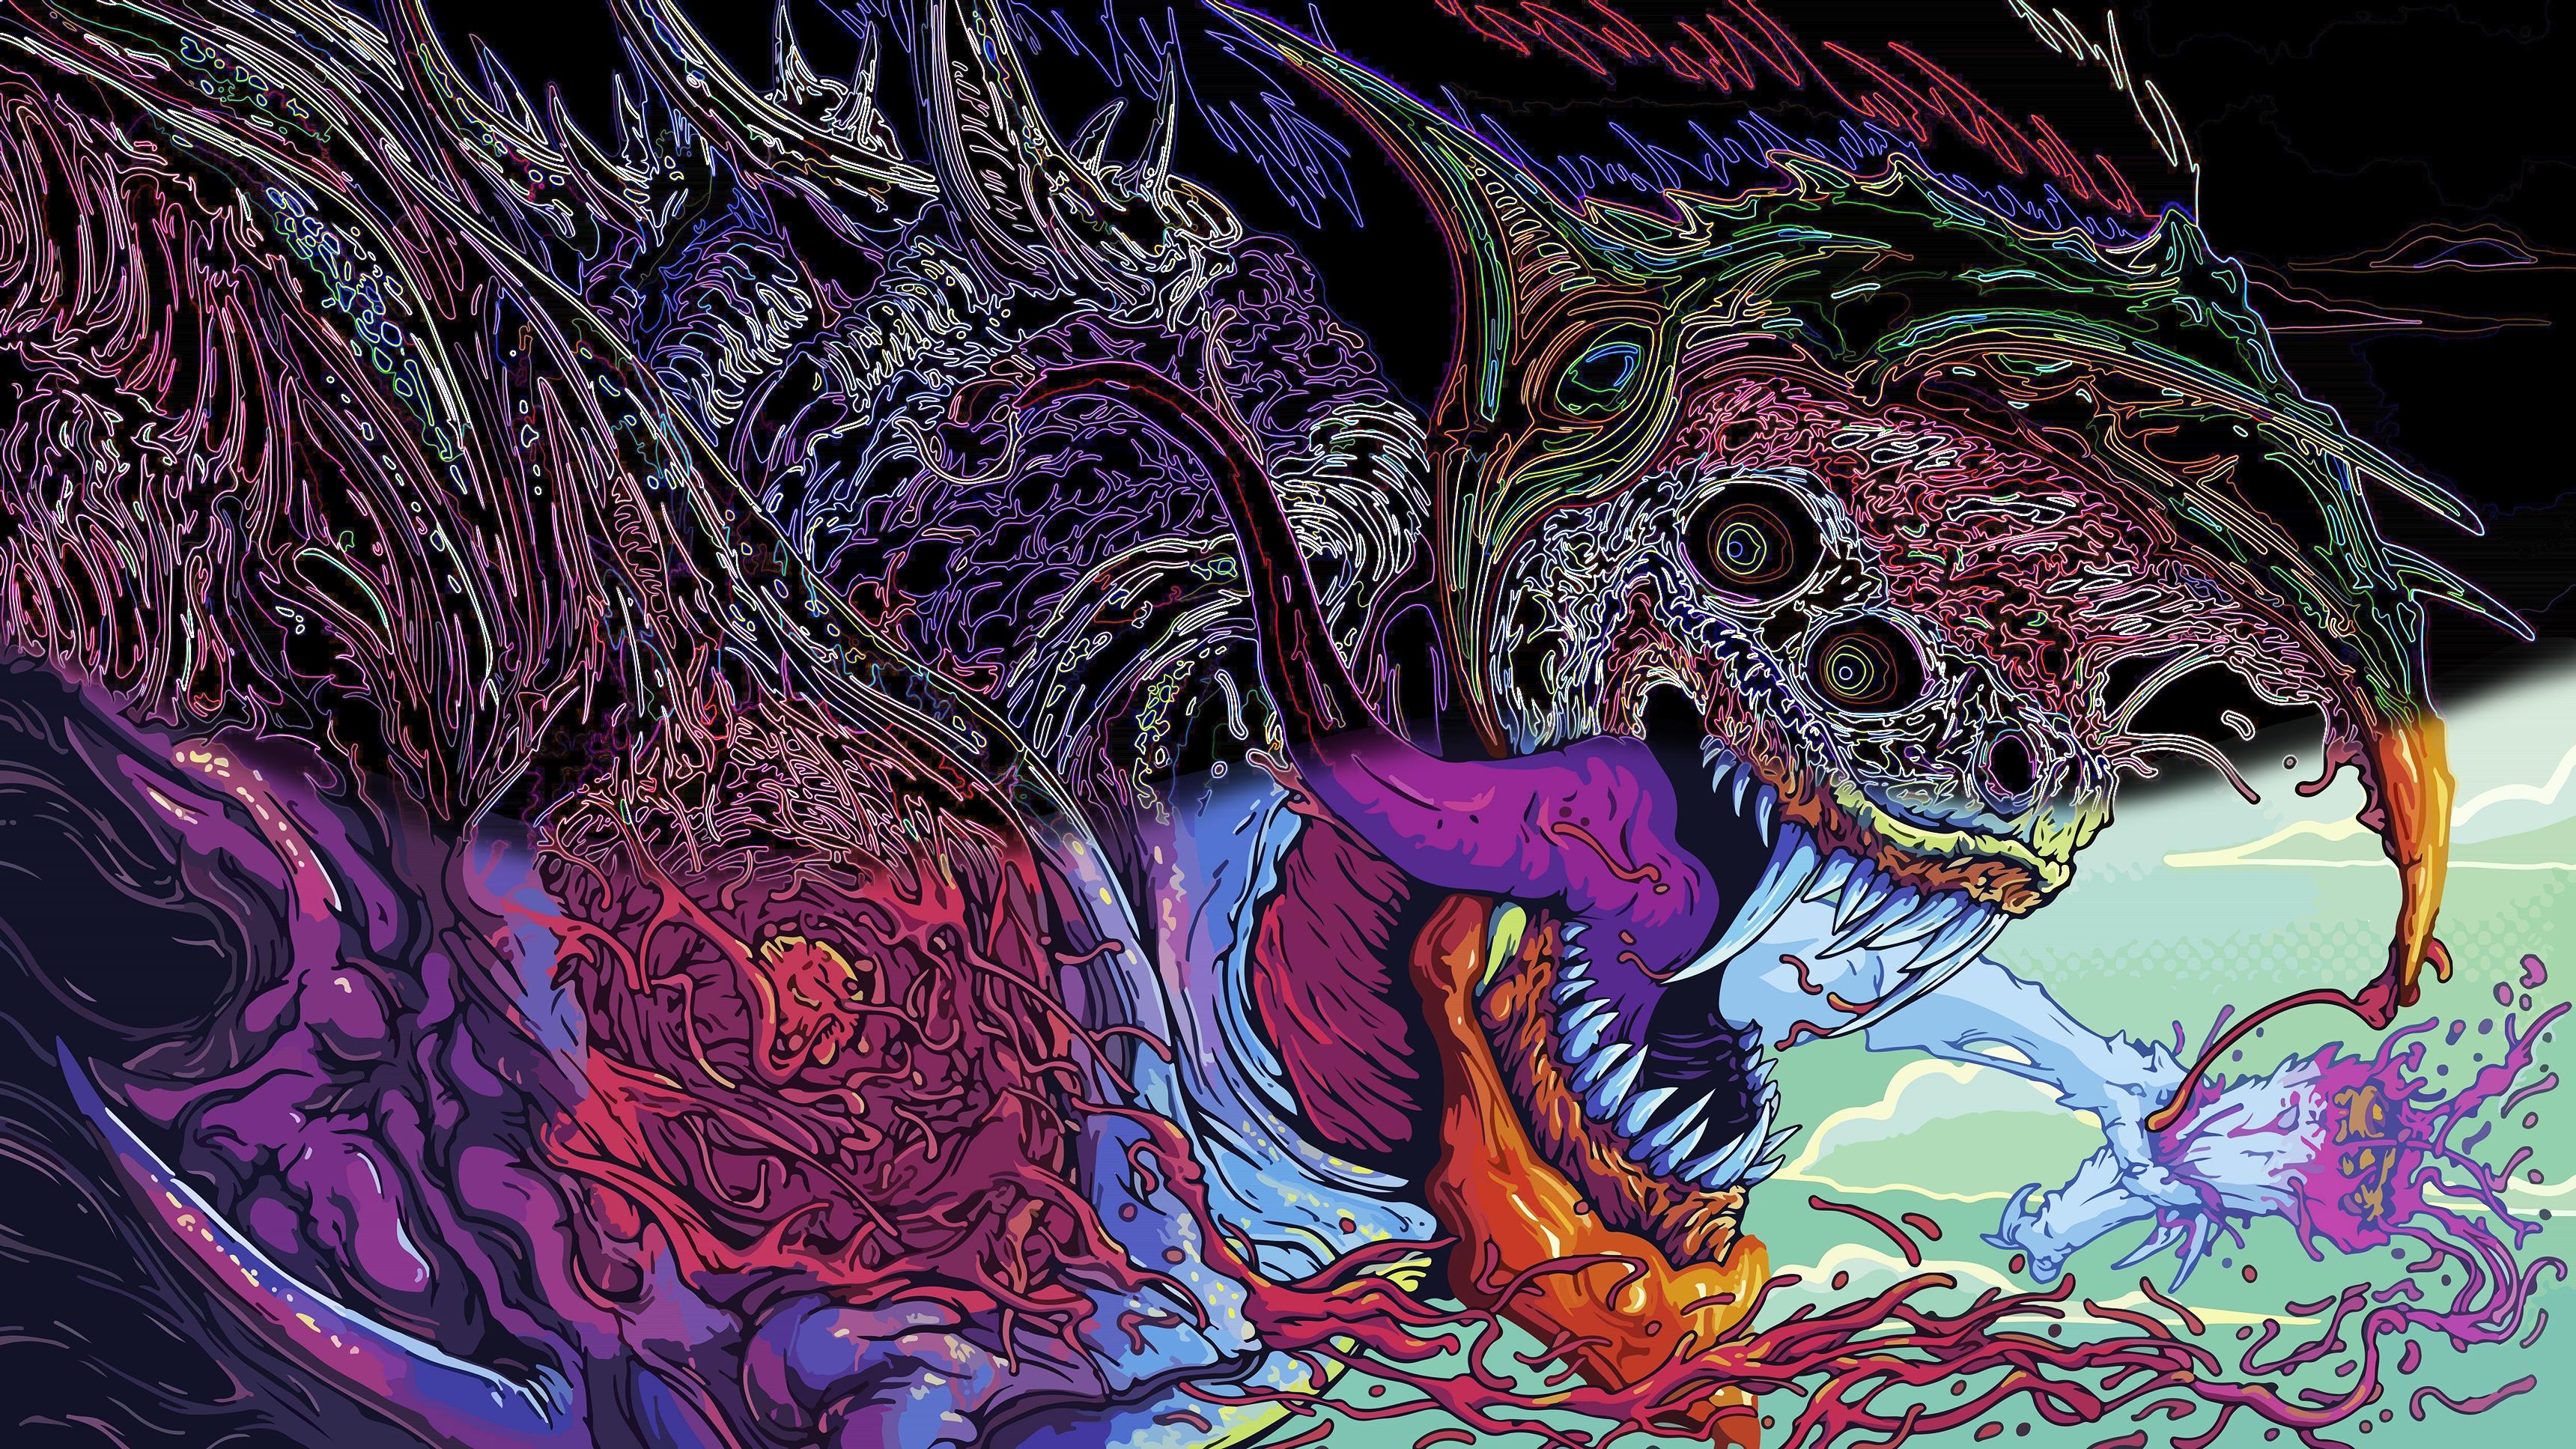 Hyper Beast edit [3440x1440] wallpaper 3440x1935